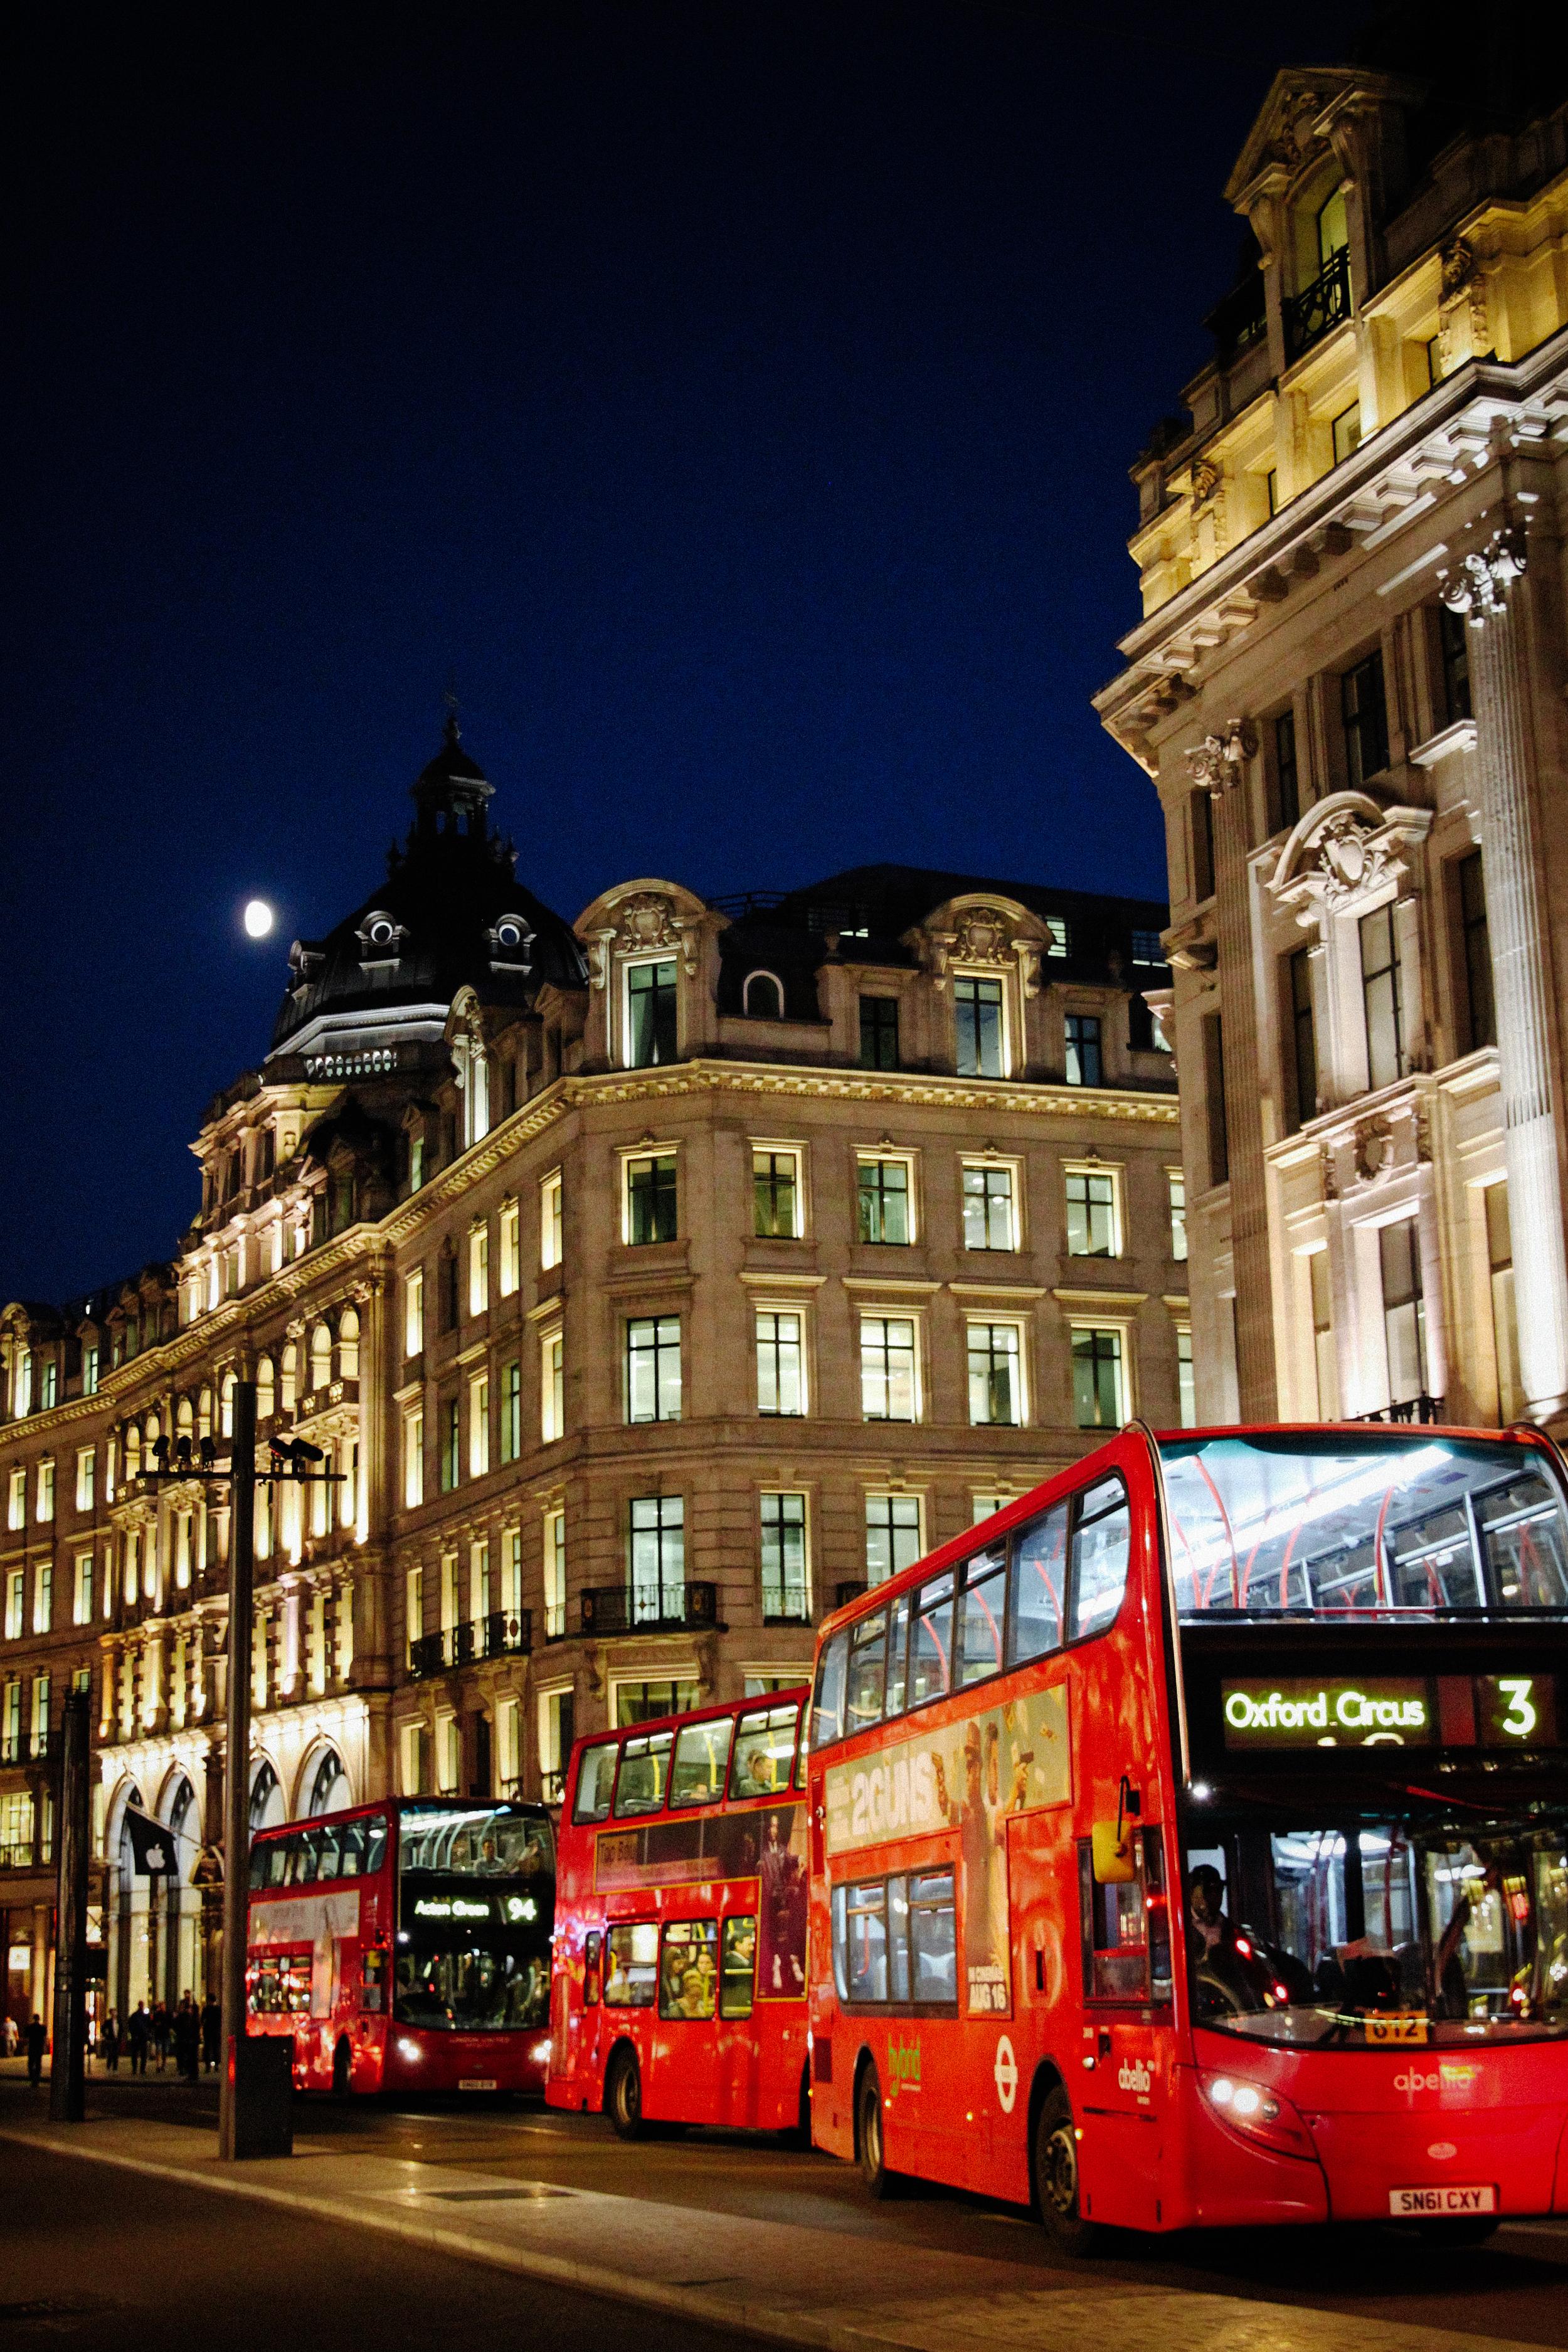 Regent Street, Oxford Circus.